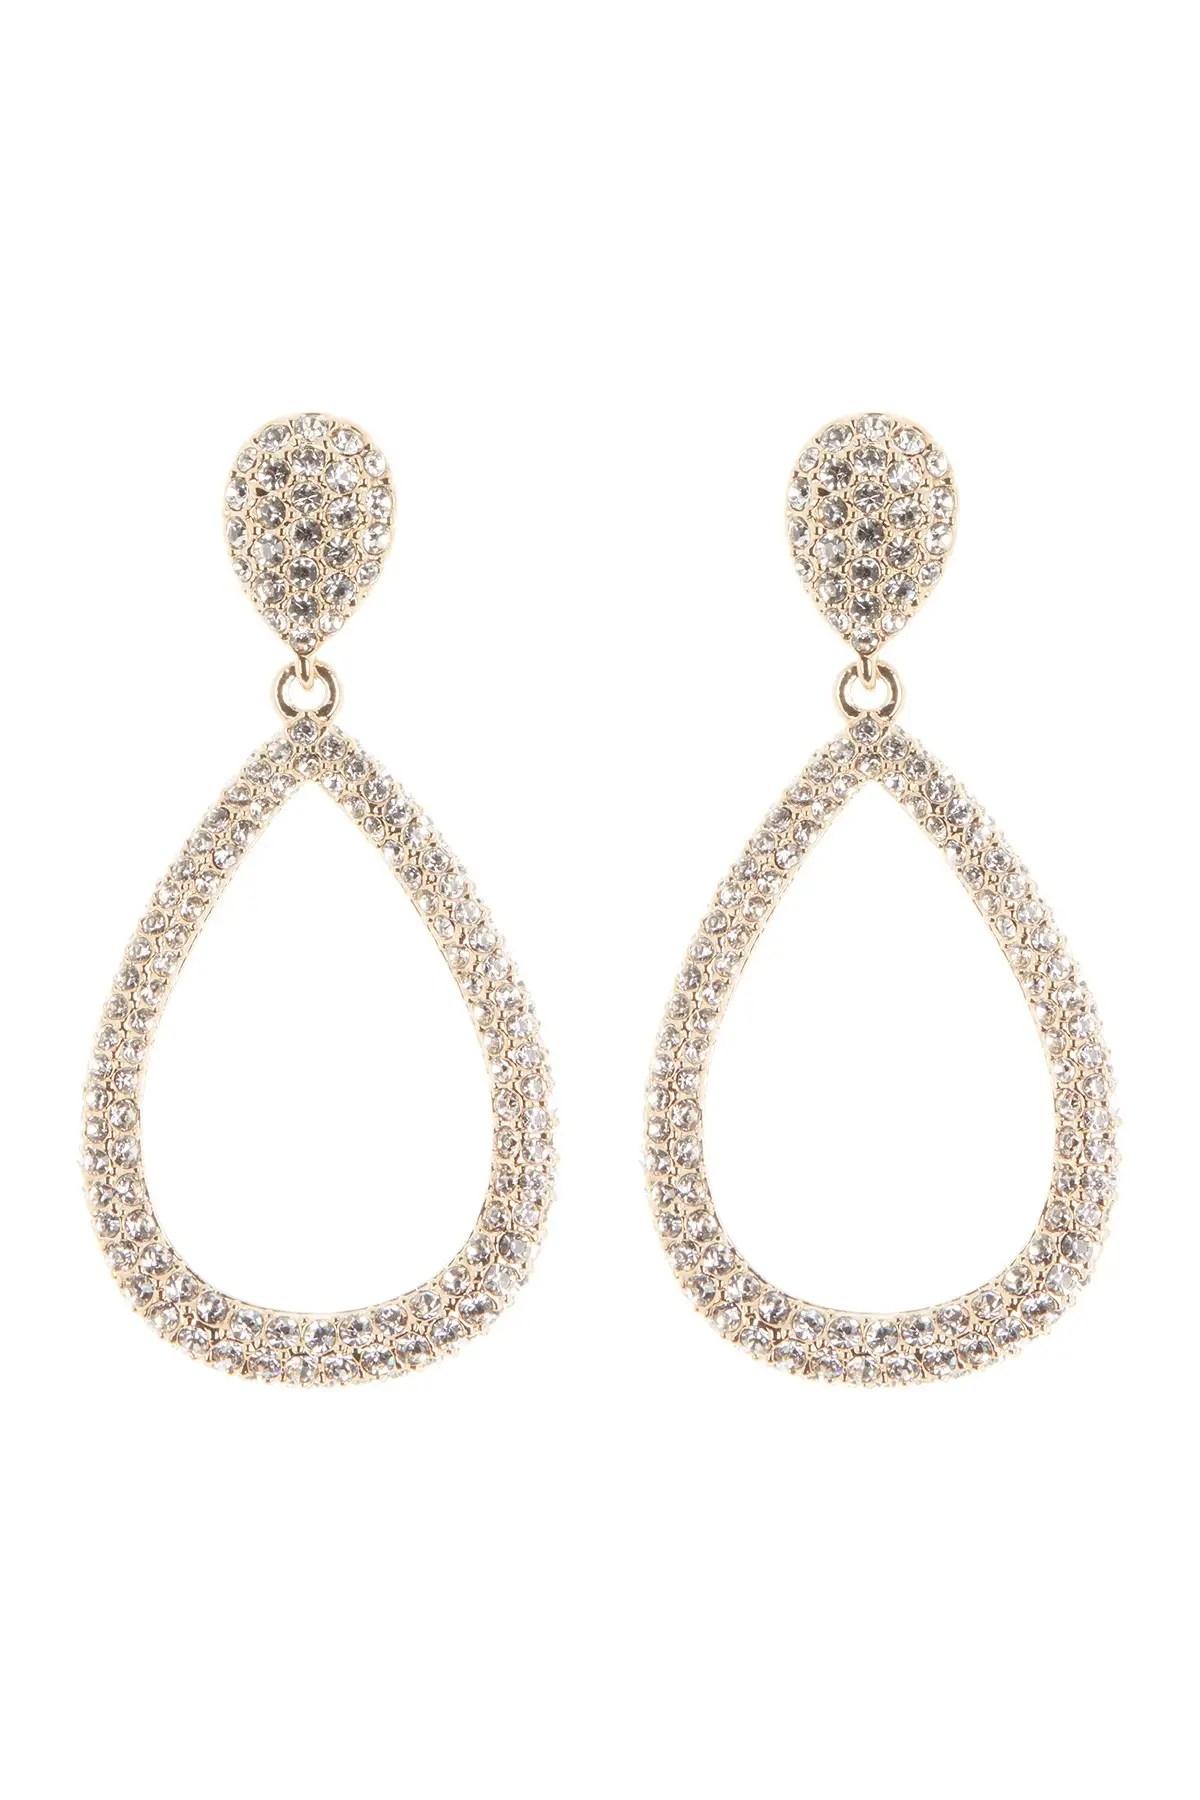 nadri crystal pave open teardrop earrings nordstrom rack